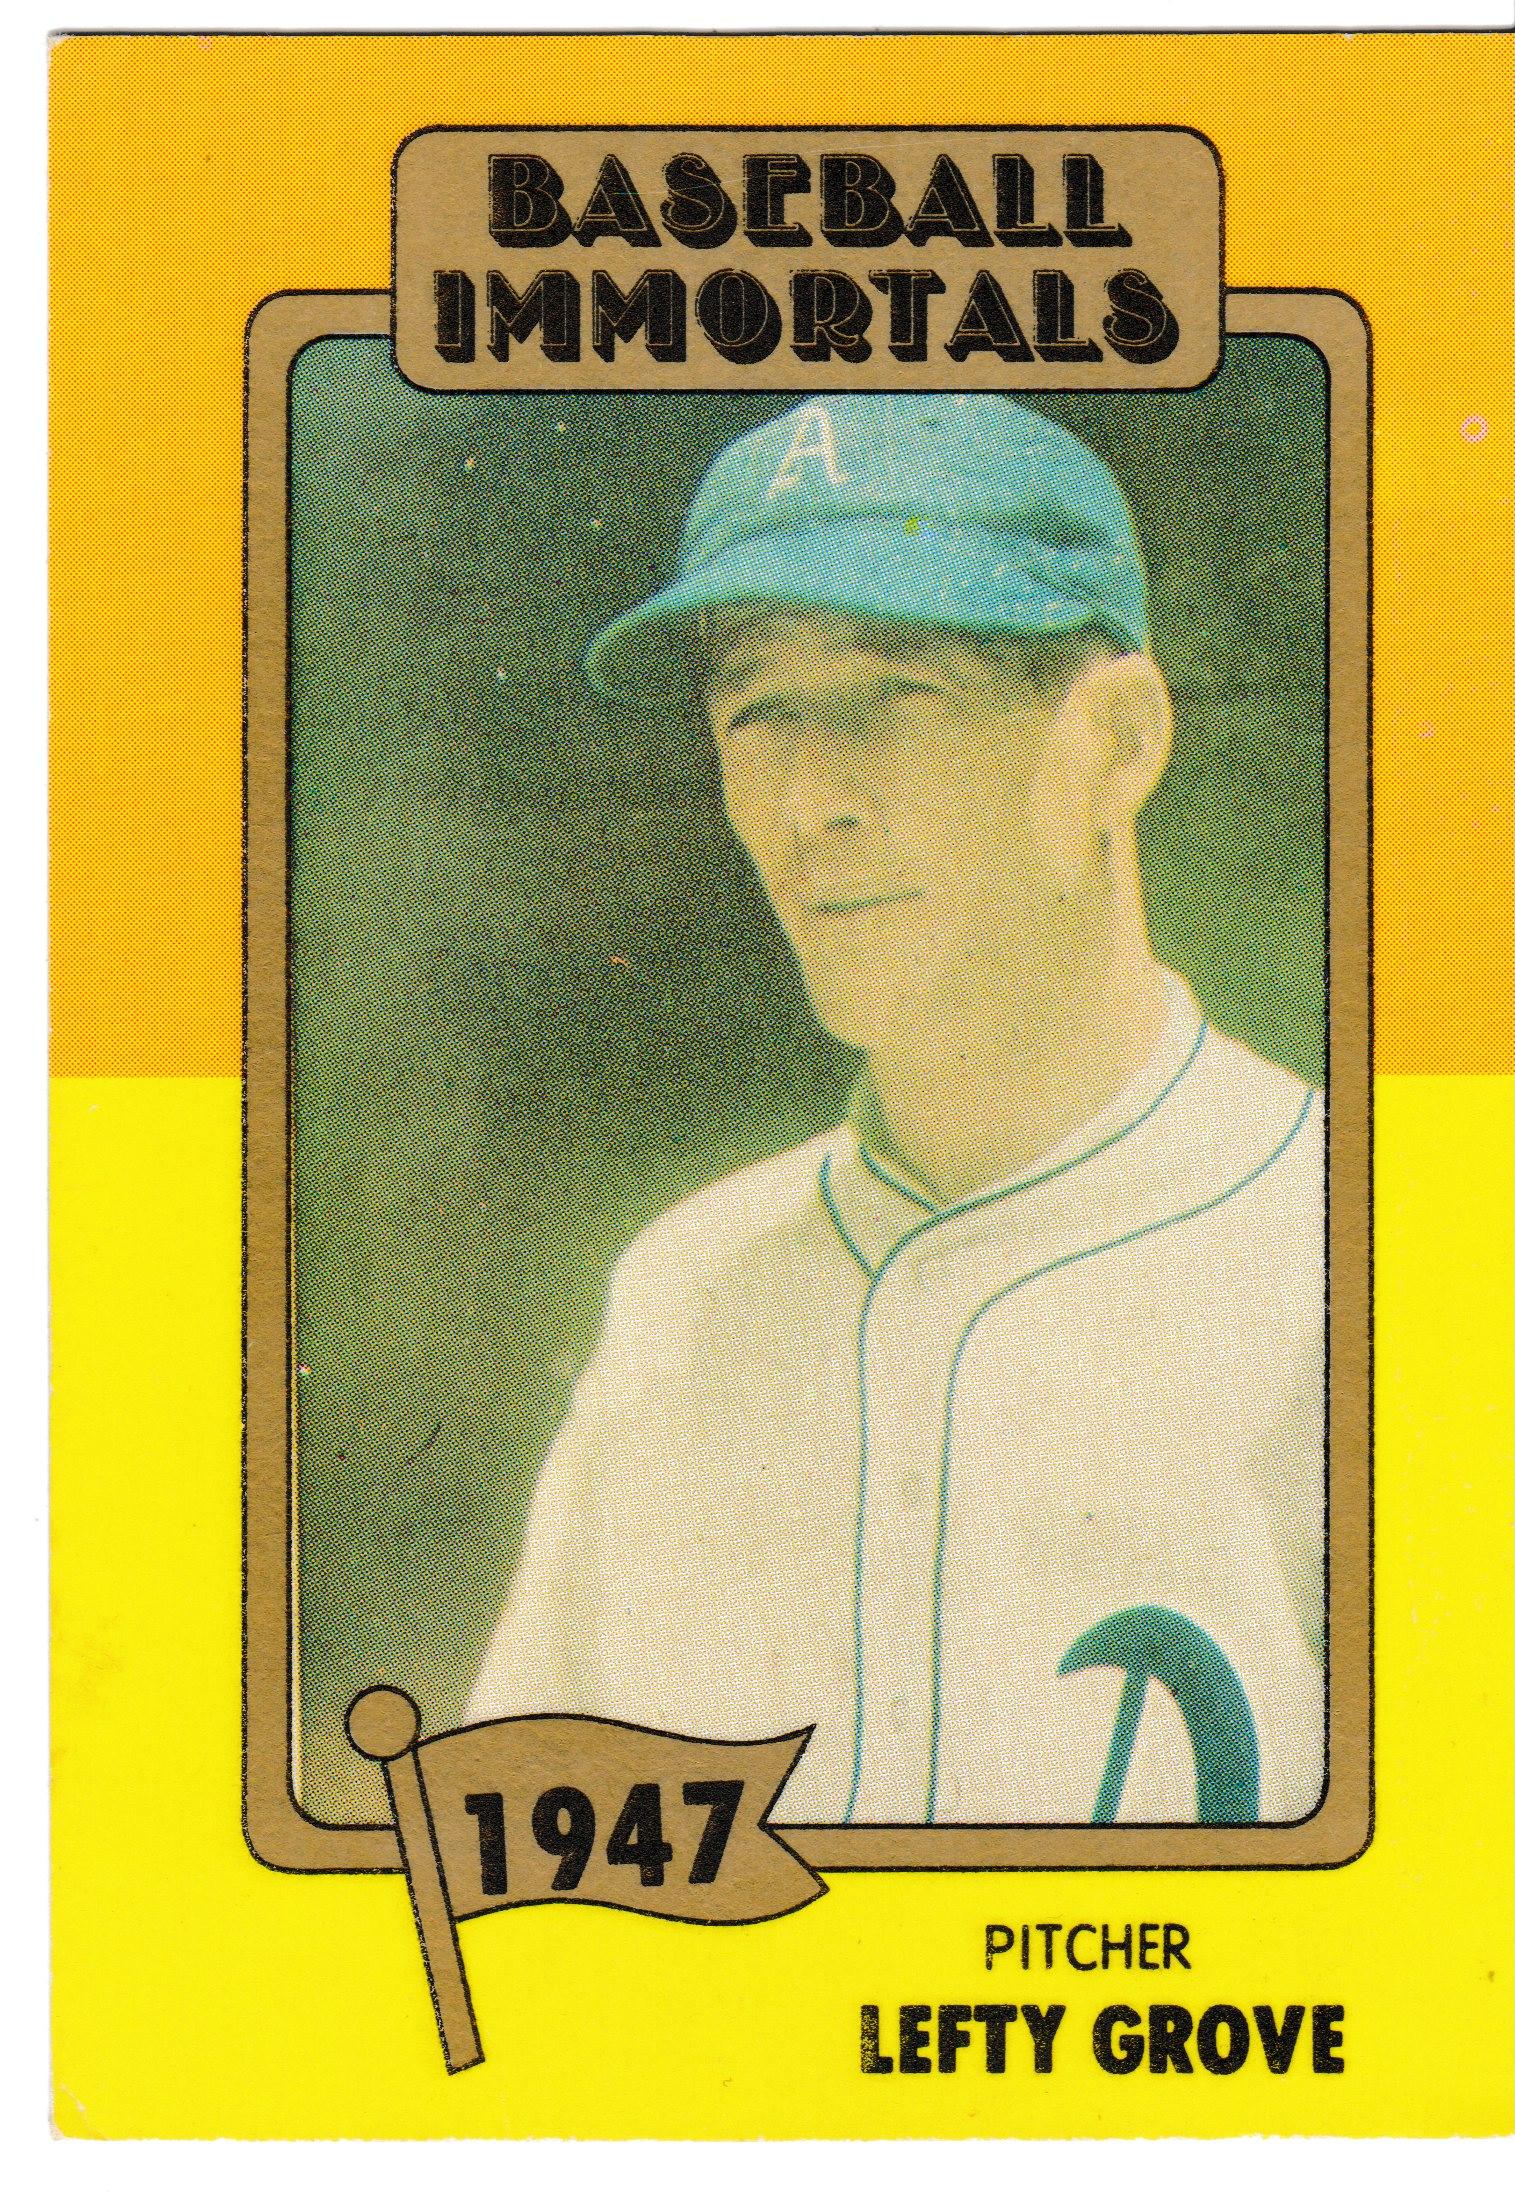 1980 Baseball Immortals Lefty Grove Baseball Cards Lefty Grove